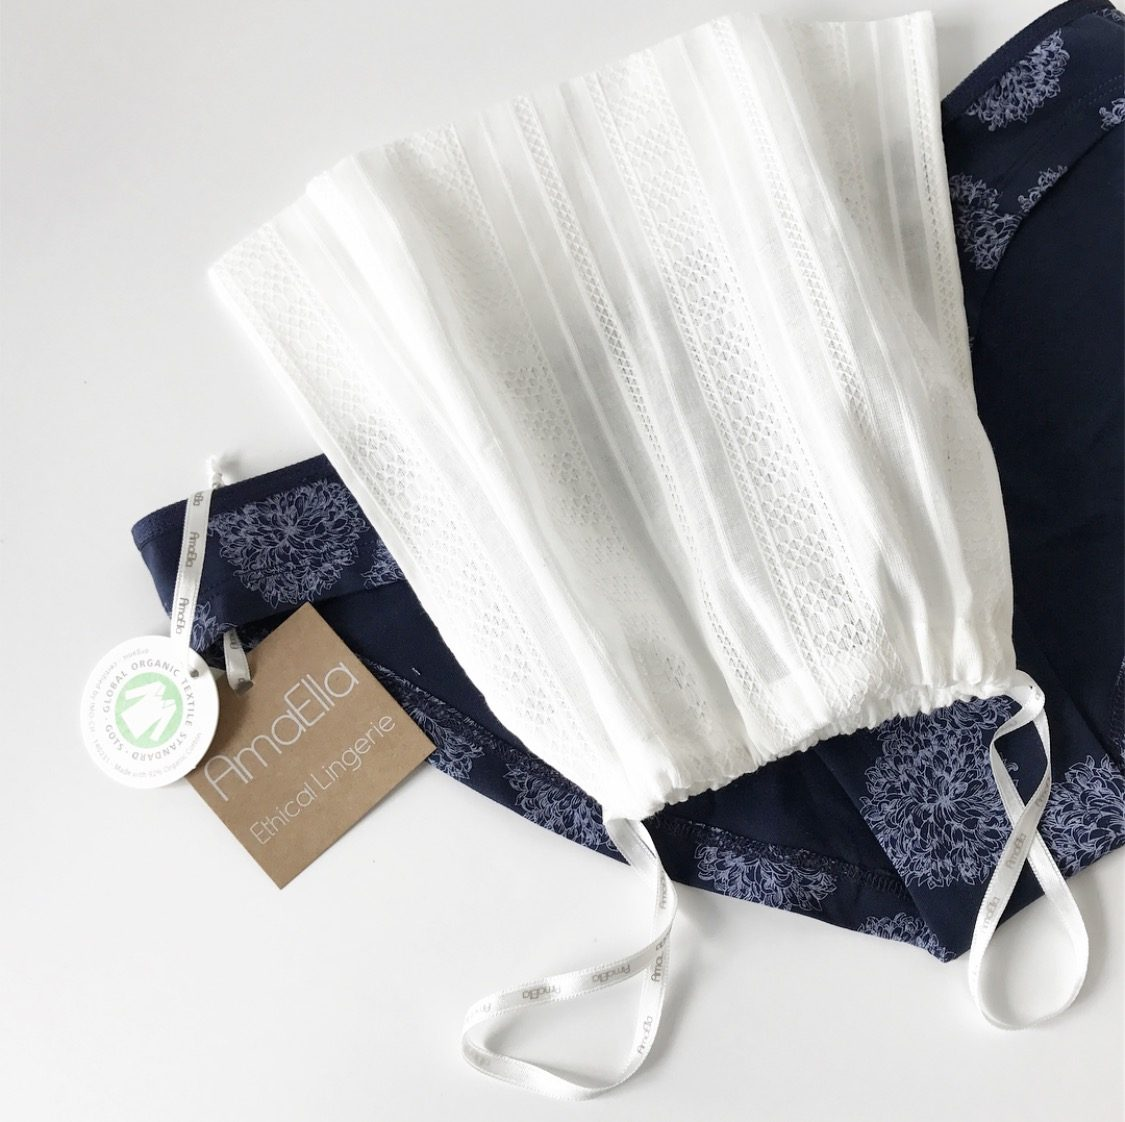 AmaElla Lingerie Bag